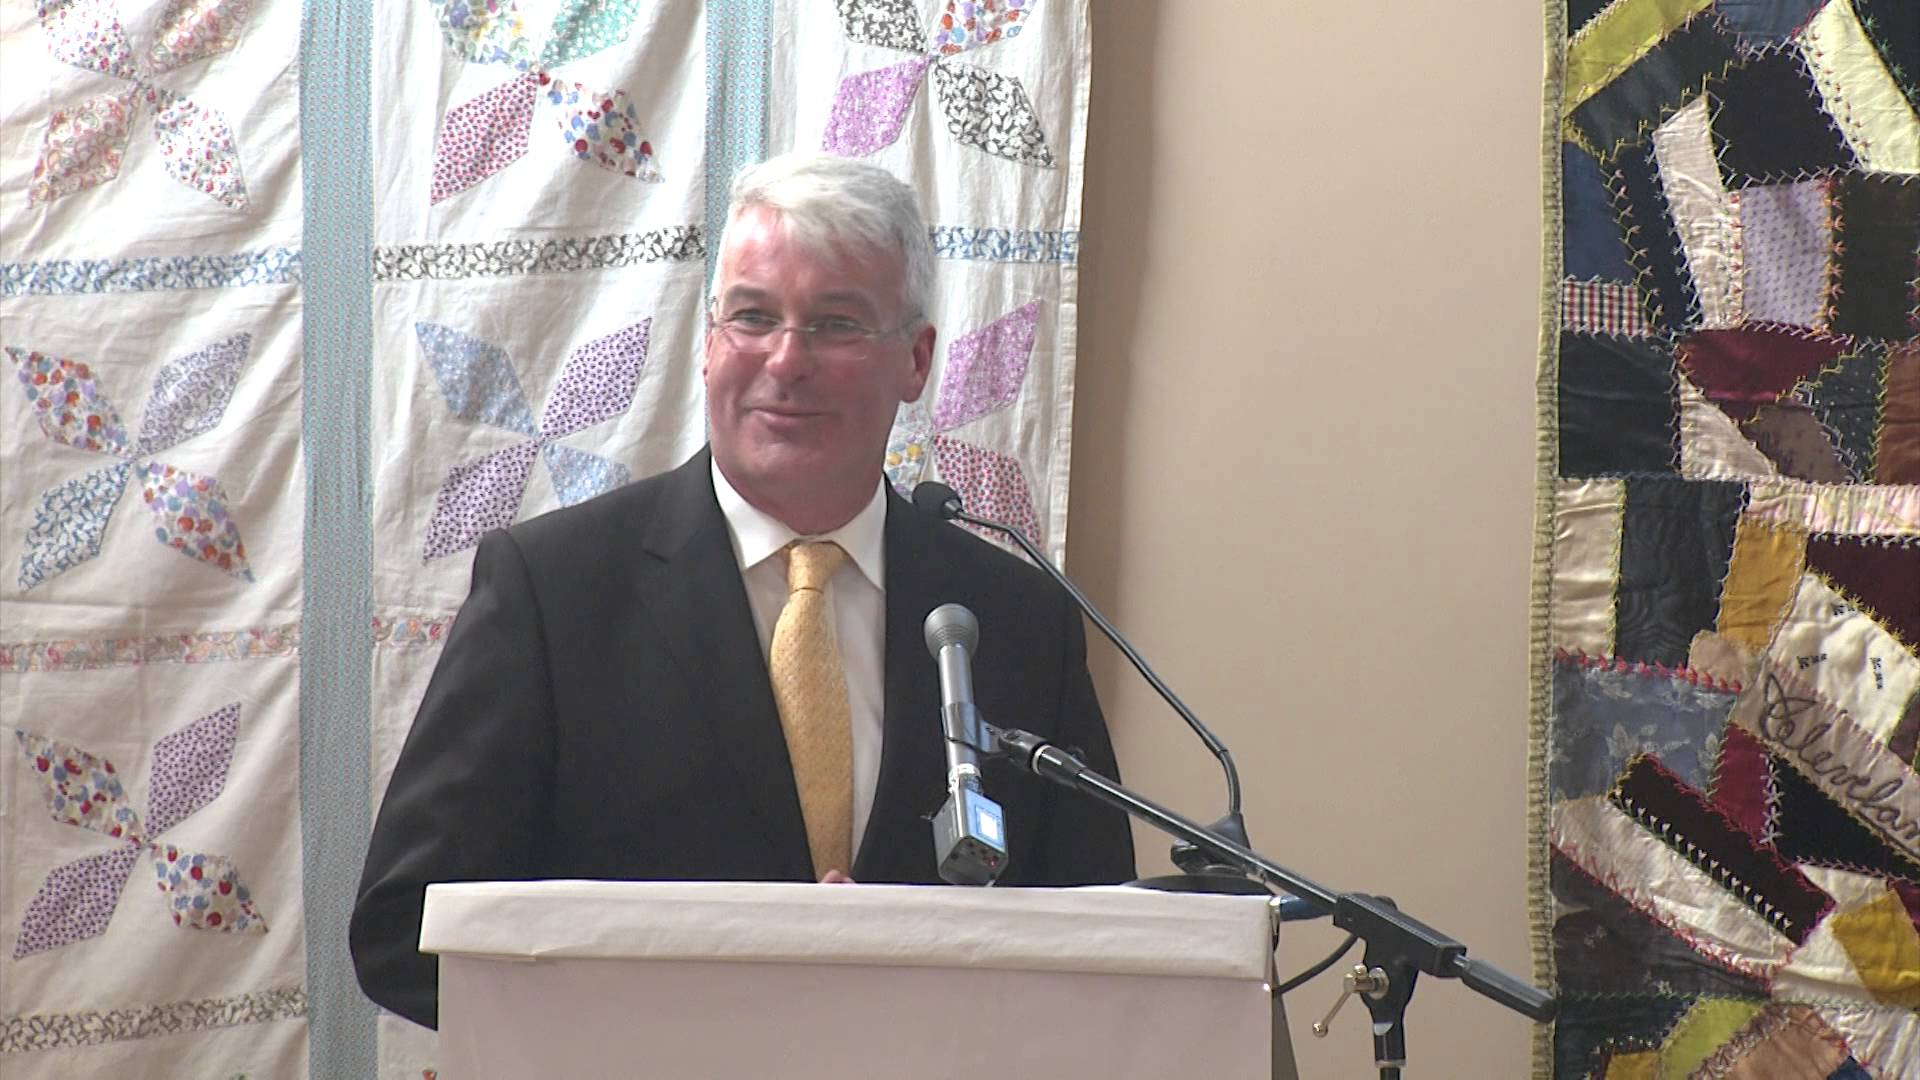 QA-Professor-Michael-Kennedy-2014-Tip-ONeill-Irish-Diaspora-Award-lecture